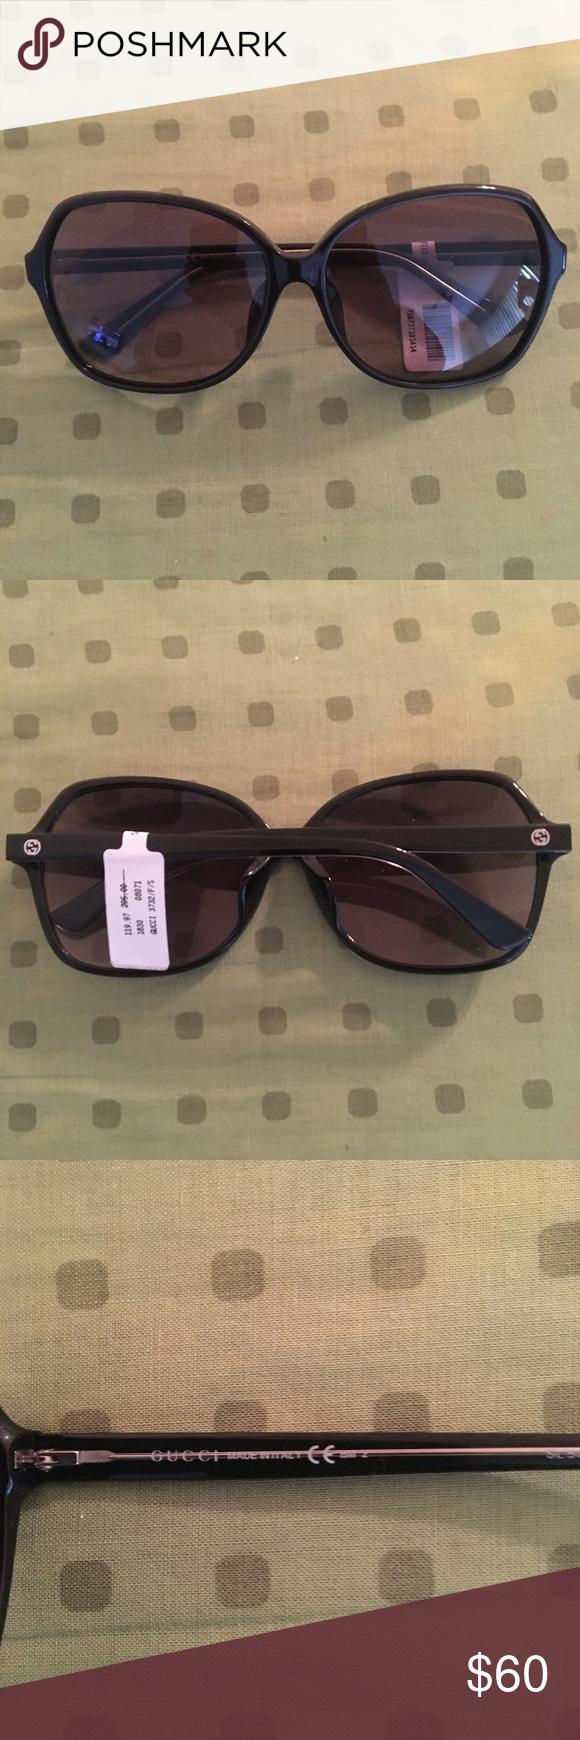 264d5ed0e1d Women s Gucci Sunglasses Great item. Brand new. Authentic. Great price.  Gucci Accessories Sunglasses